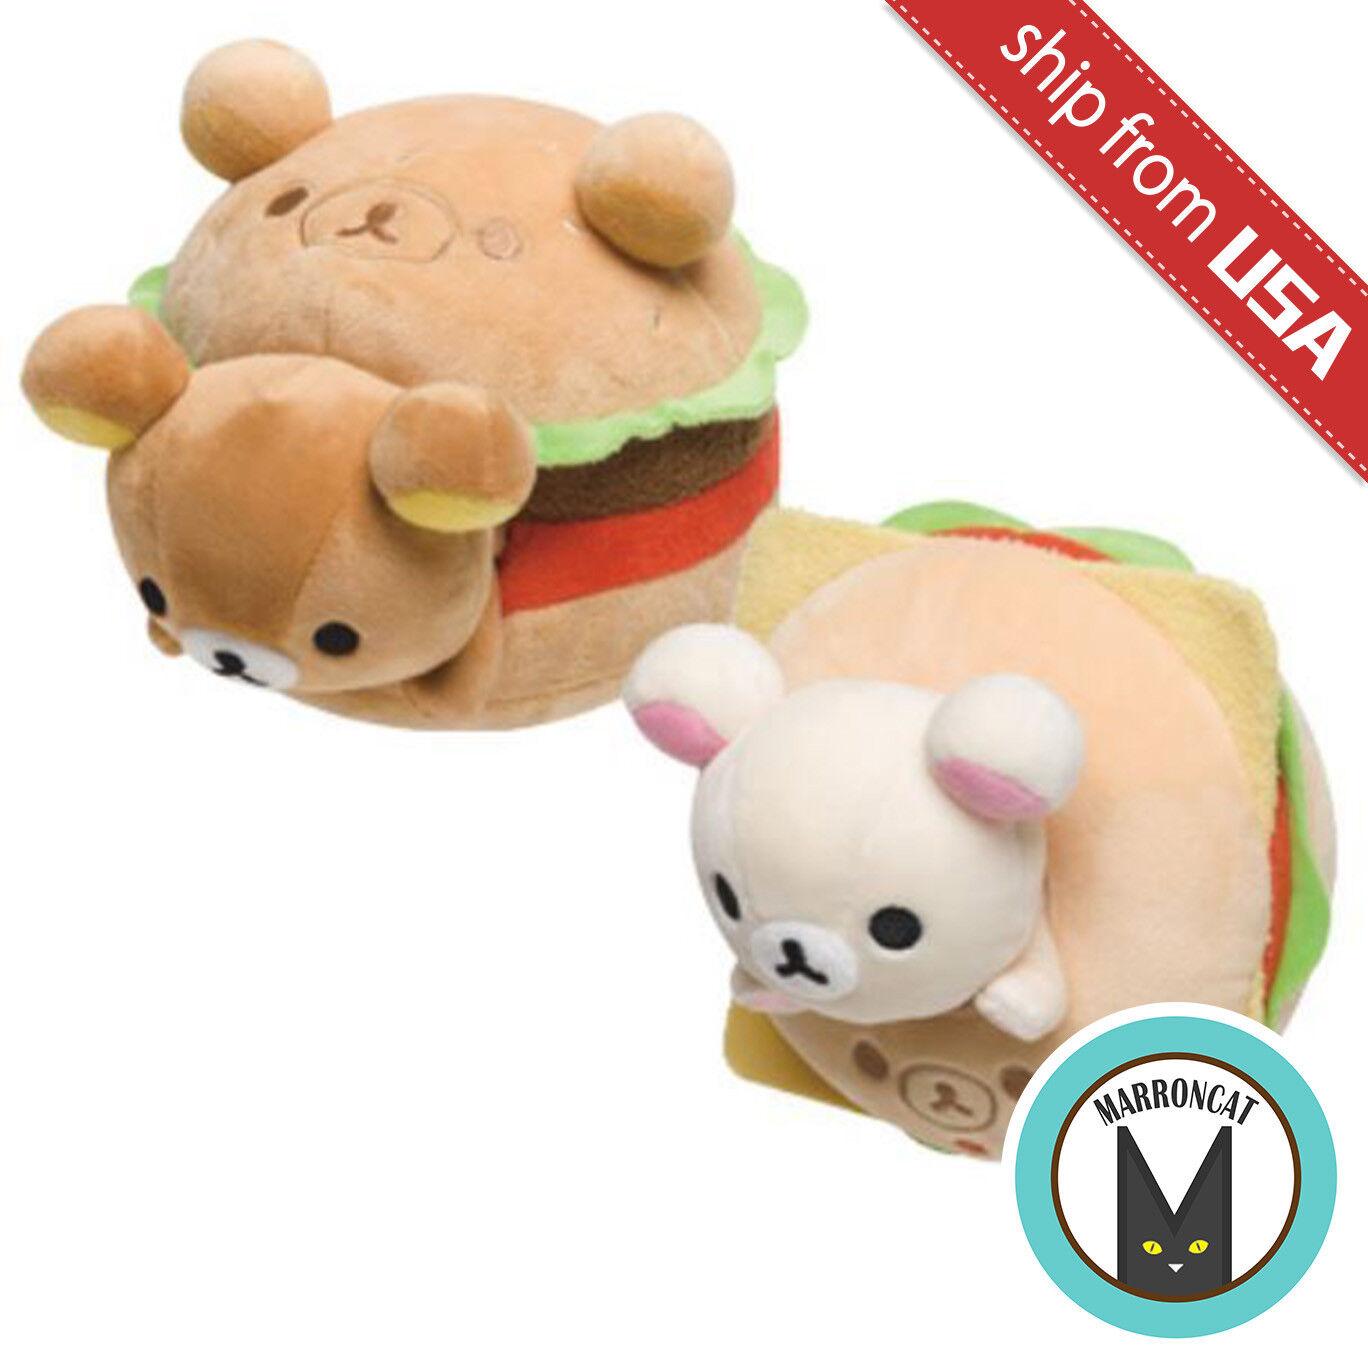 1 Japan San-X Rilakkuma Burger or Korilakkuma Bagel Soft Plush Doll Toy Stuffed